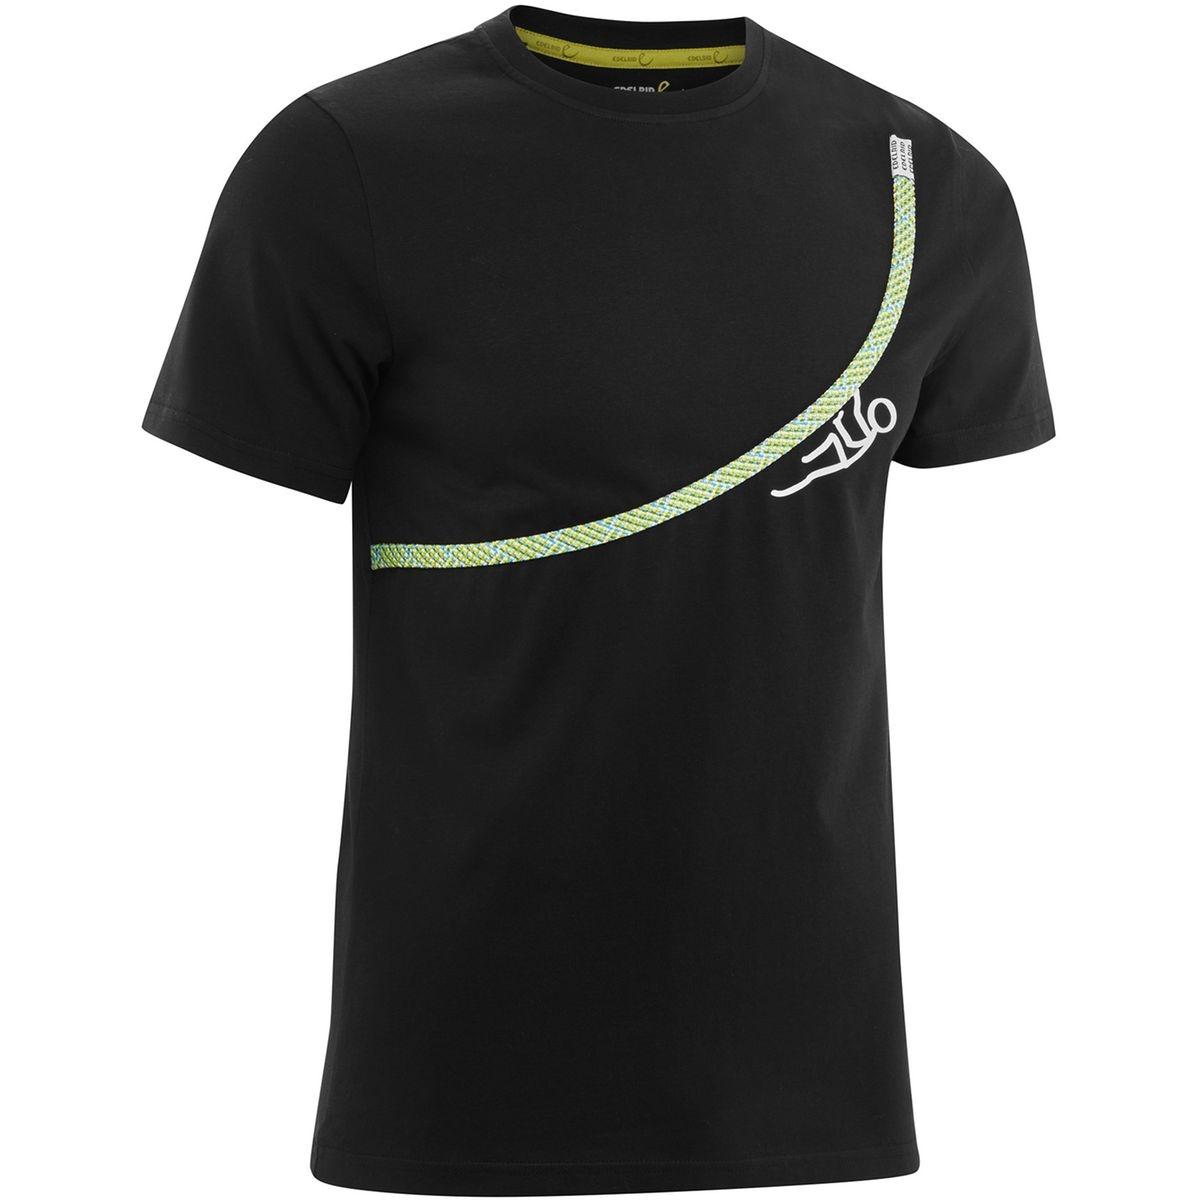 Rope - T-shirt manches courtes Homme - noir